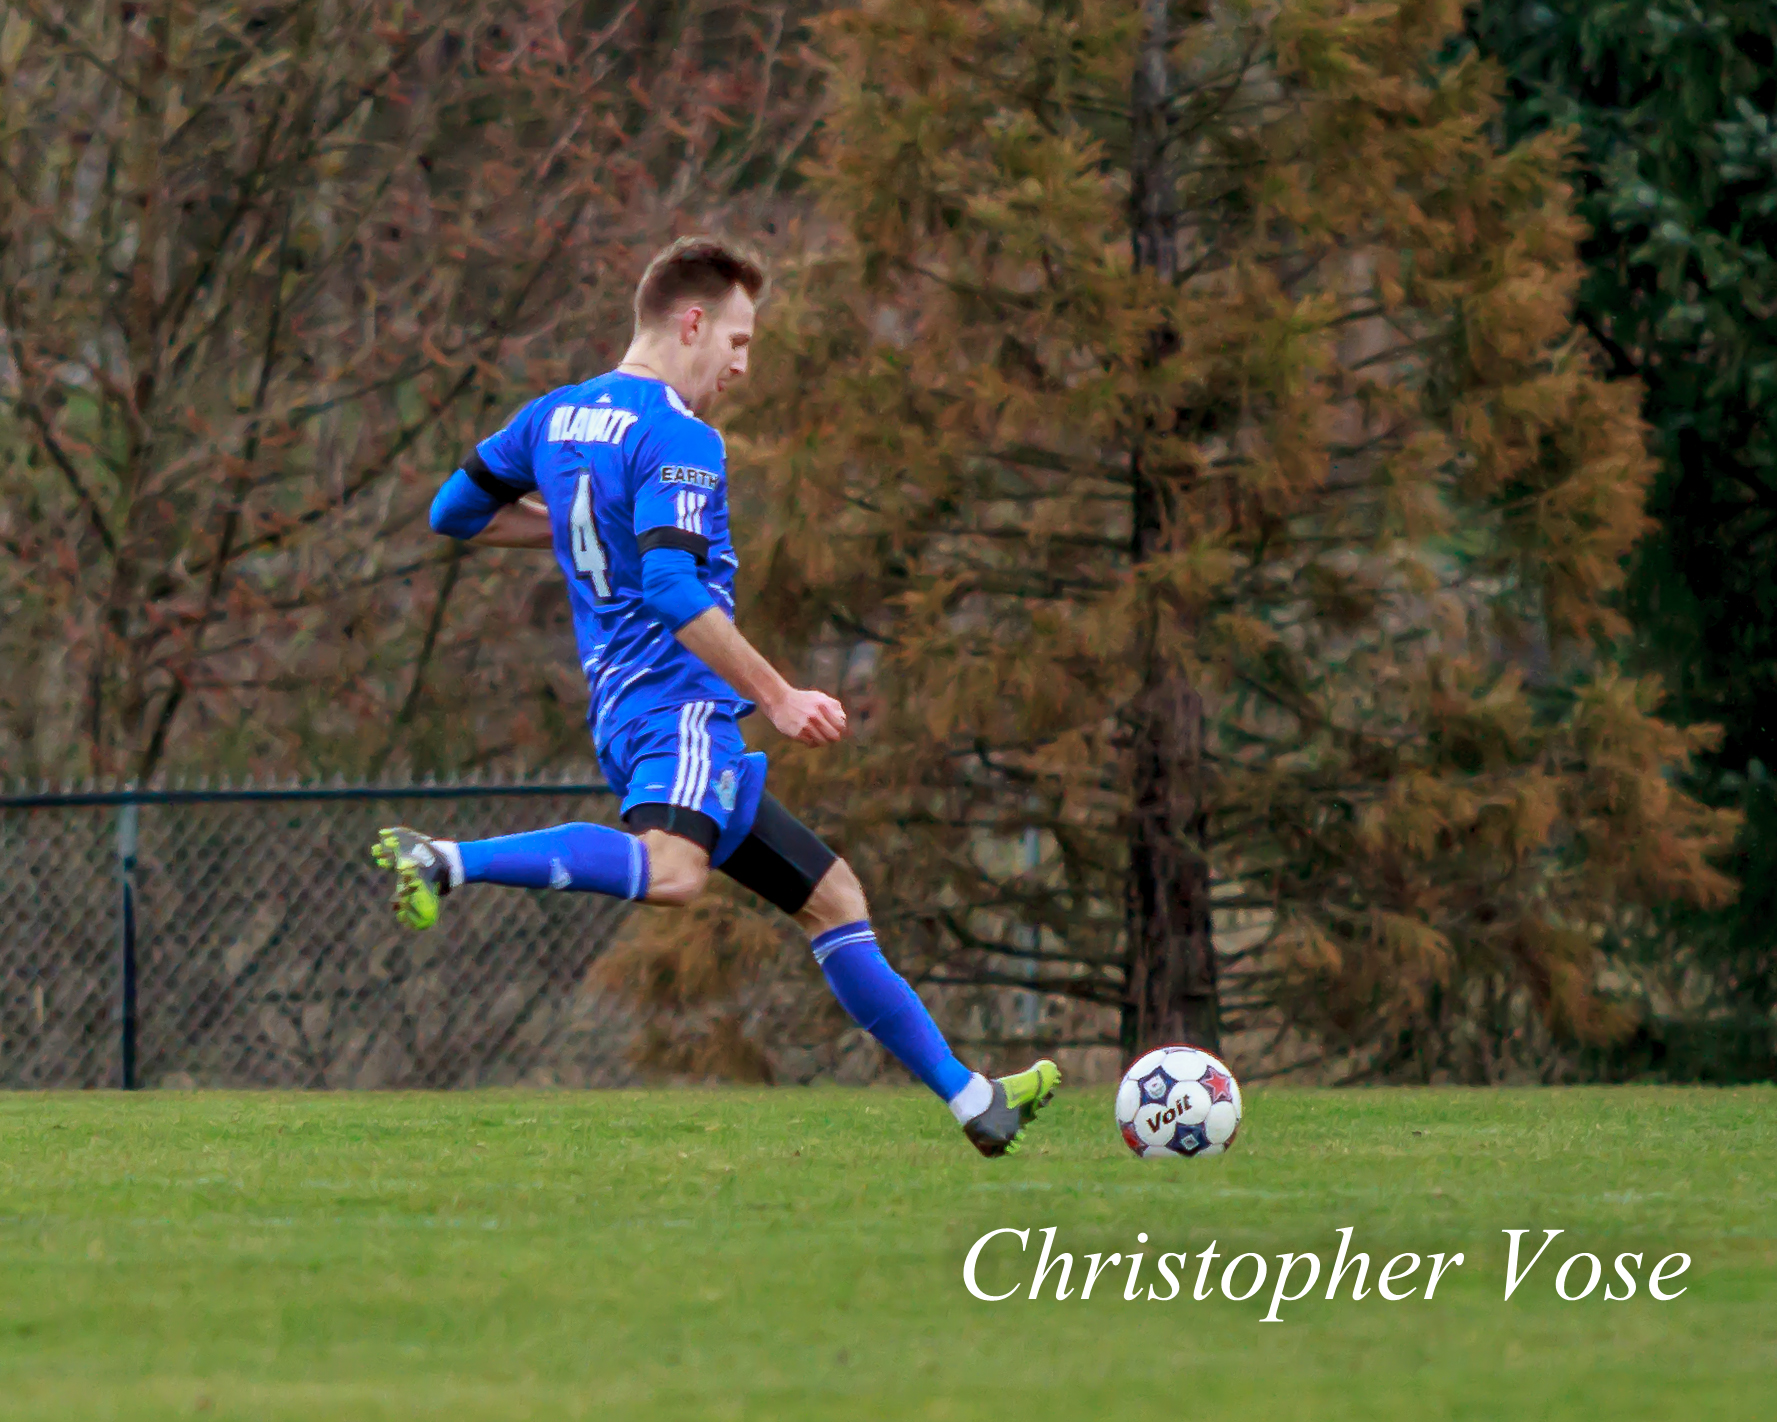 2014-03-19 Neil Hlavaty Penalty Kick.jpg